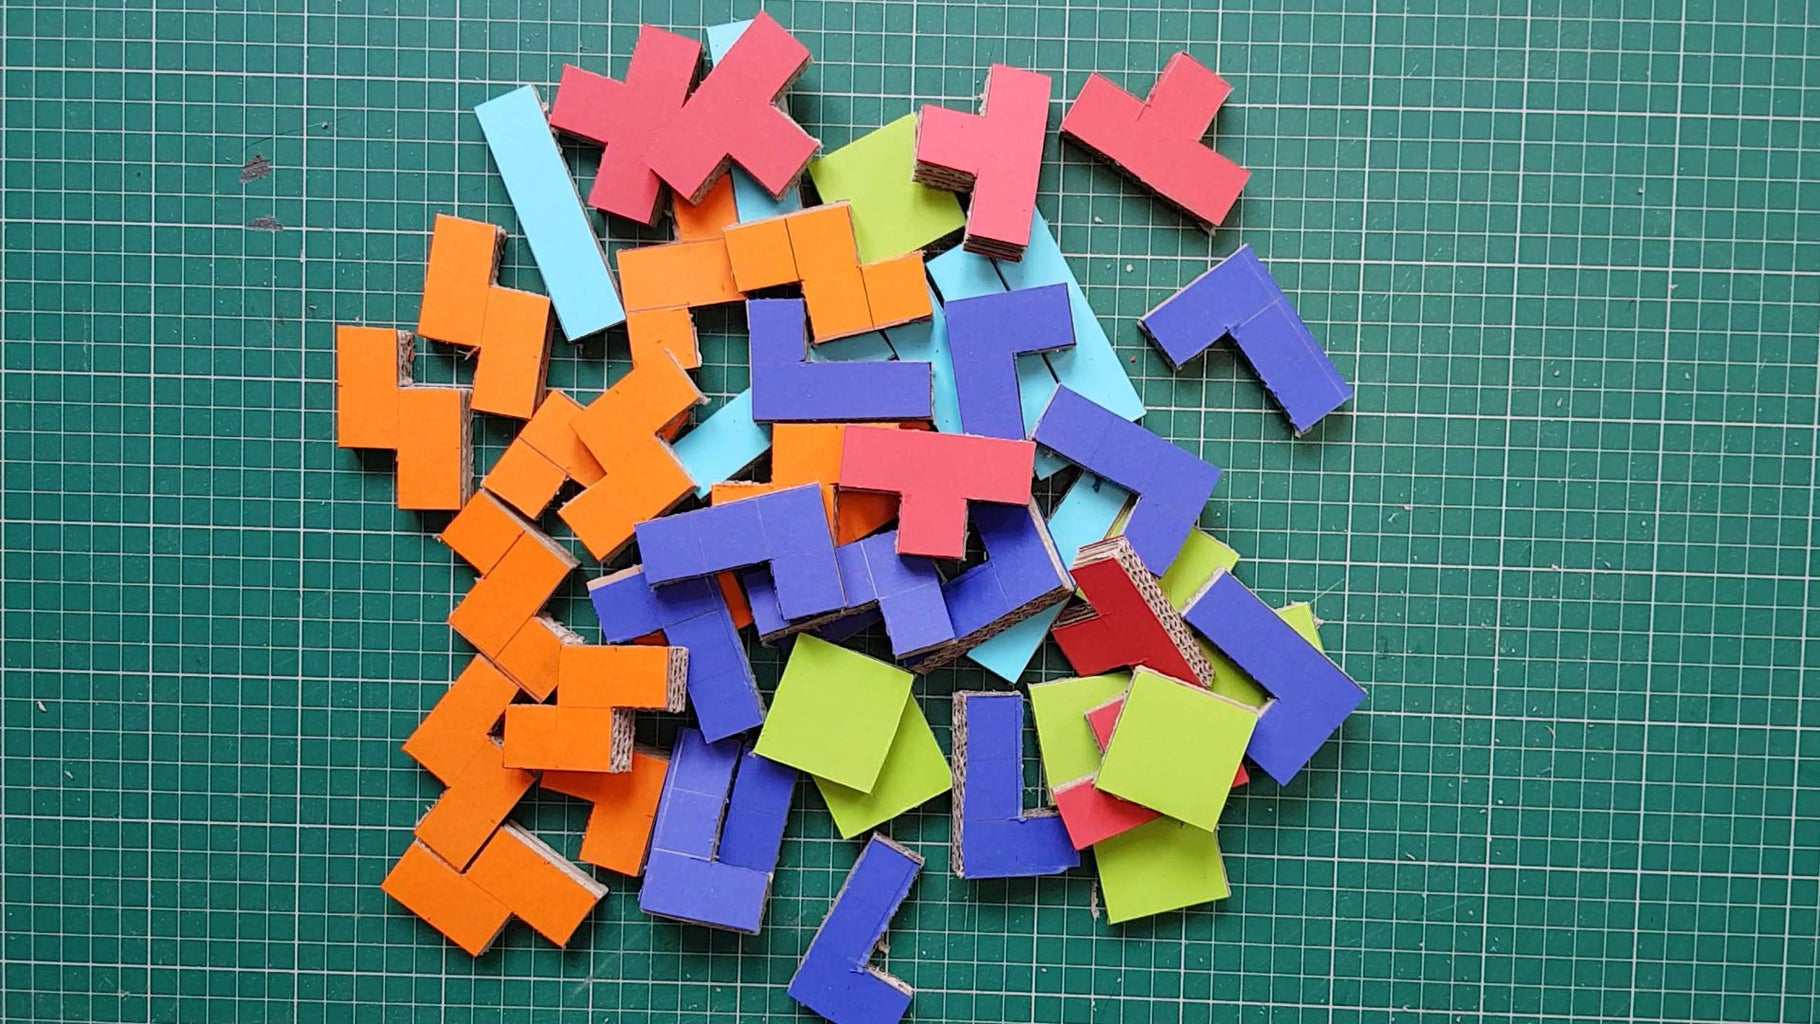 Make the Tetris Blocks